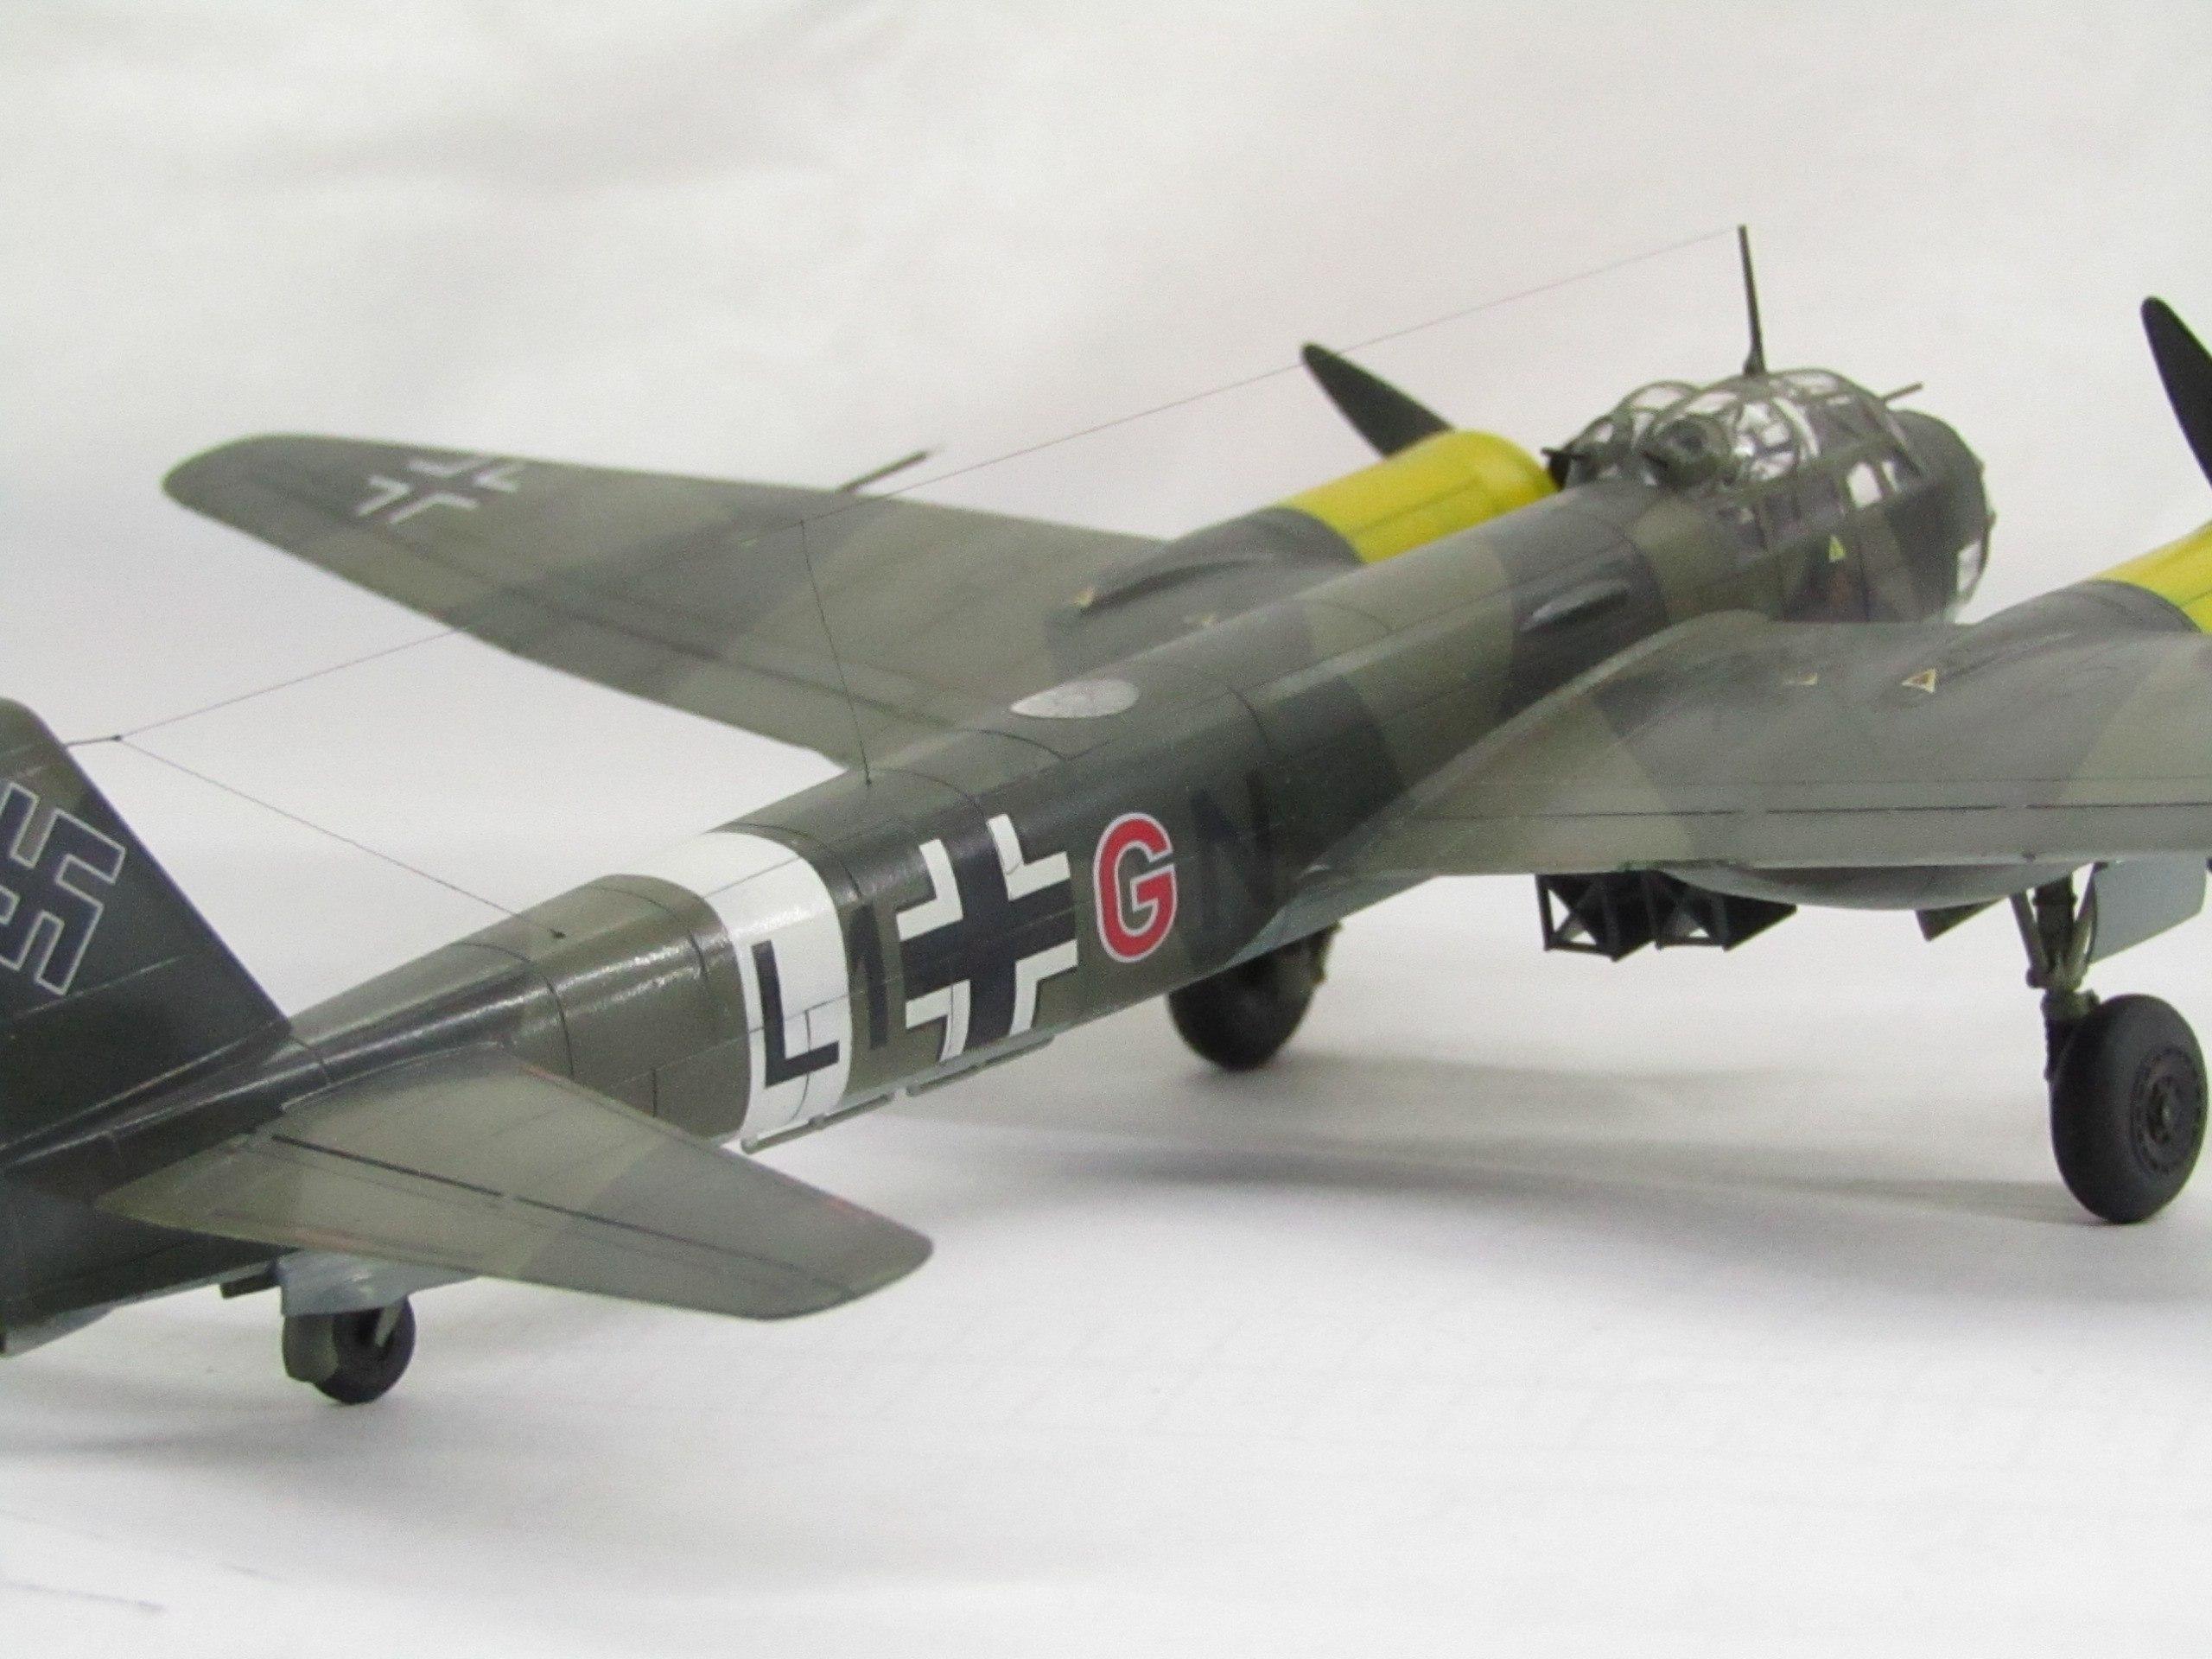 Ju-88 A-4 1/72 (Звезда) NH3v5okmylw